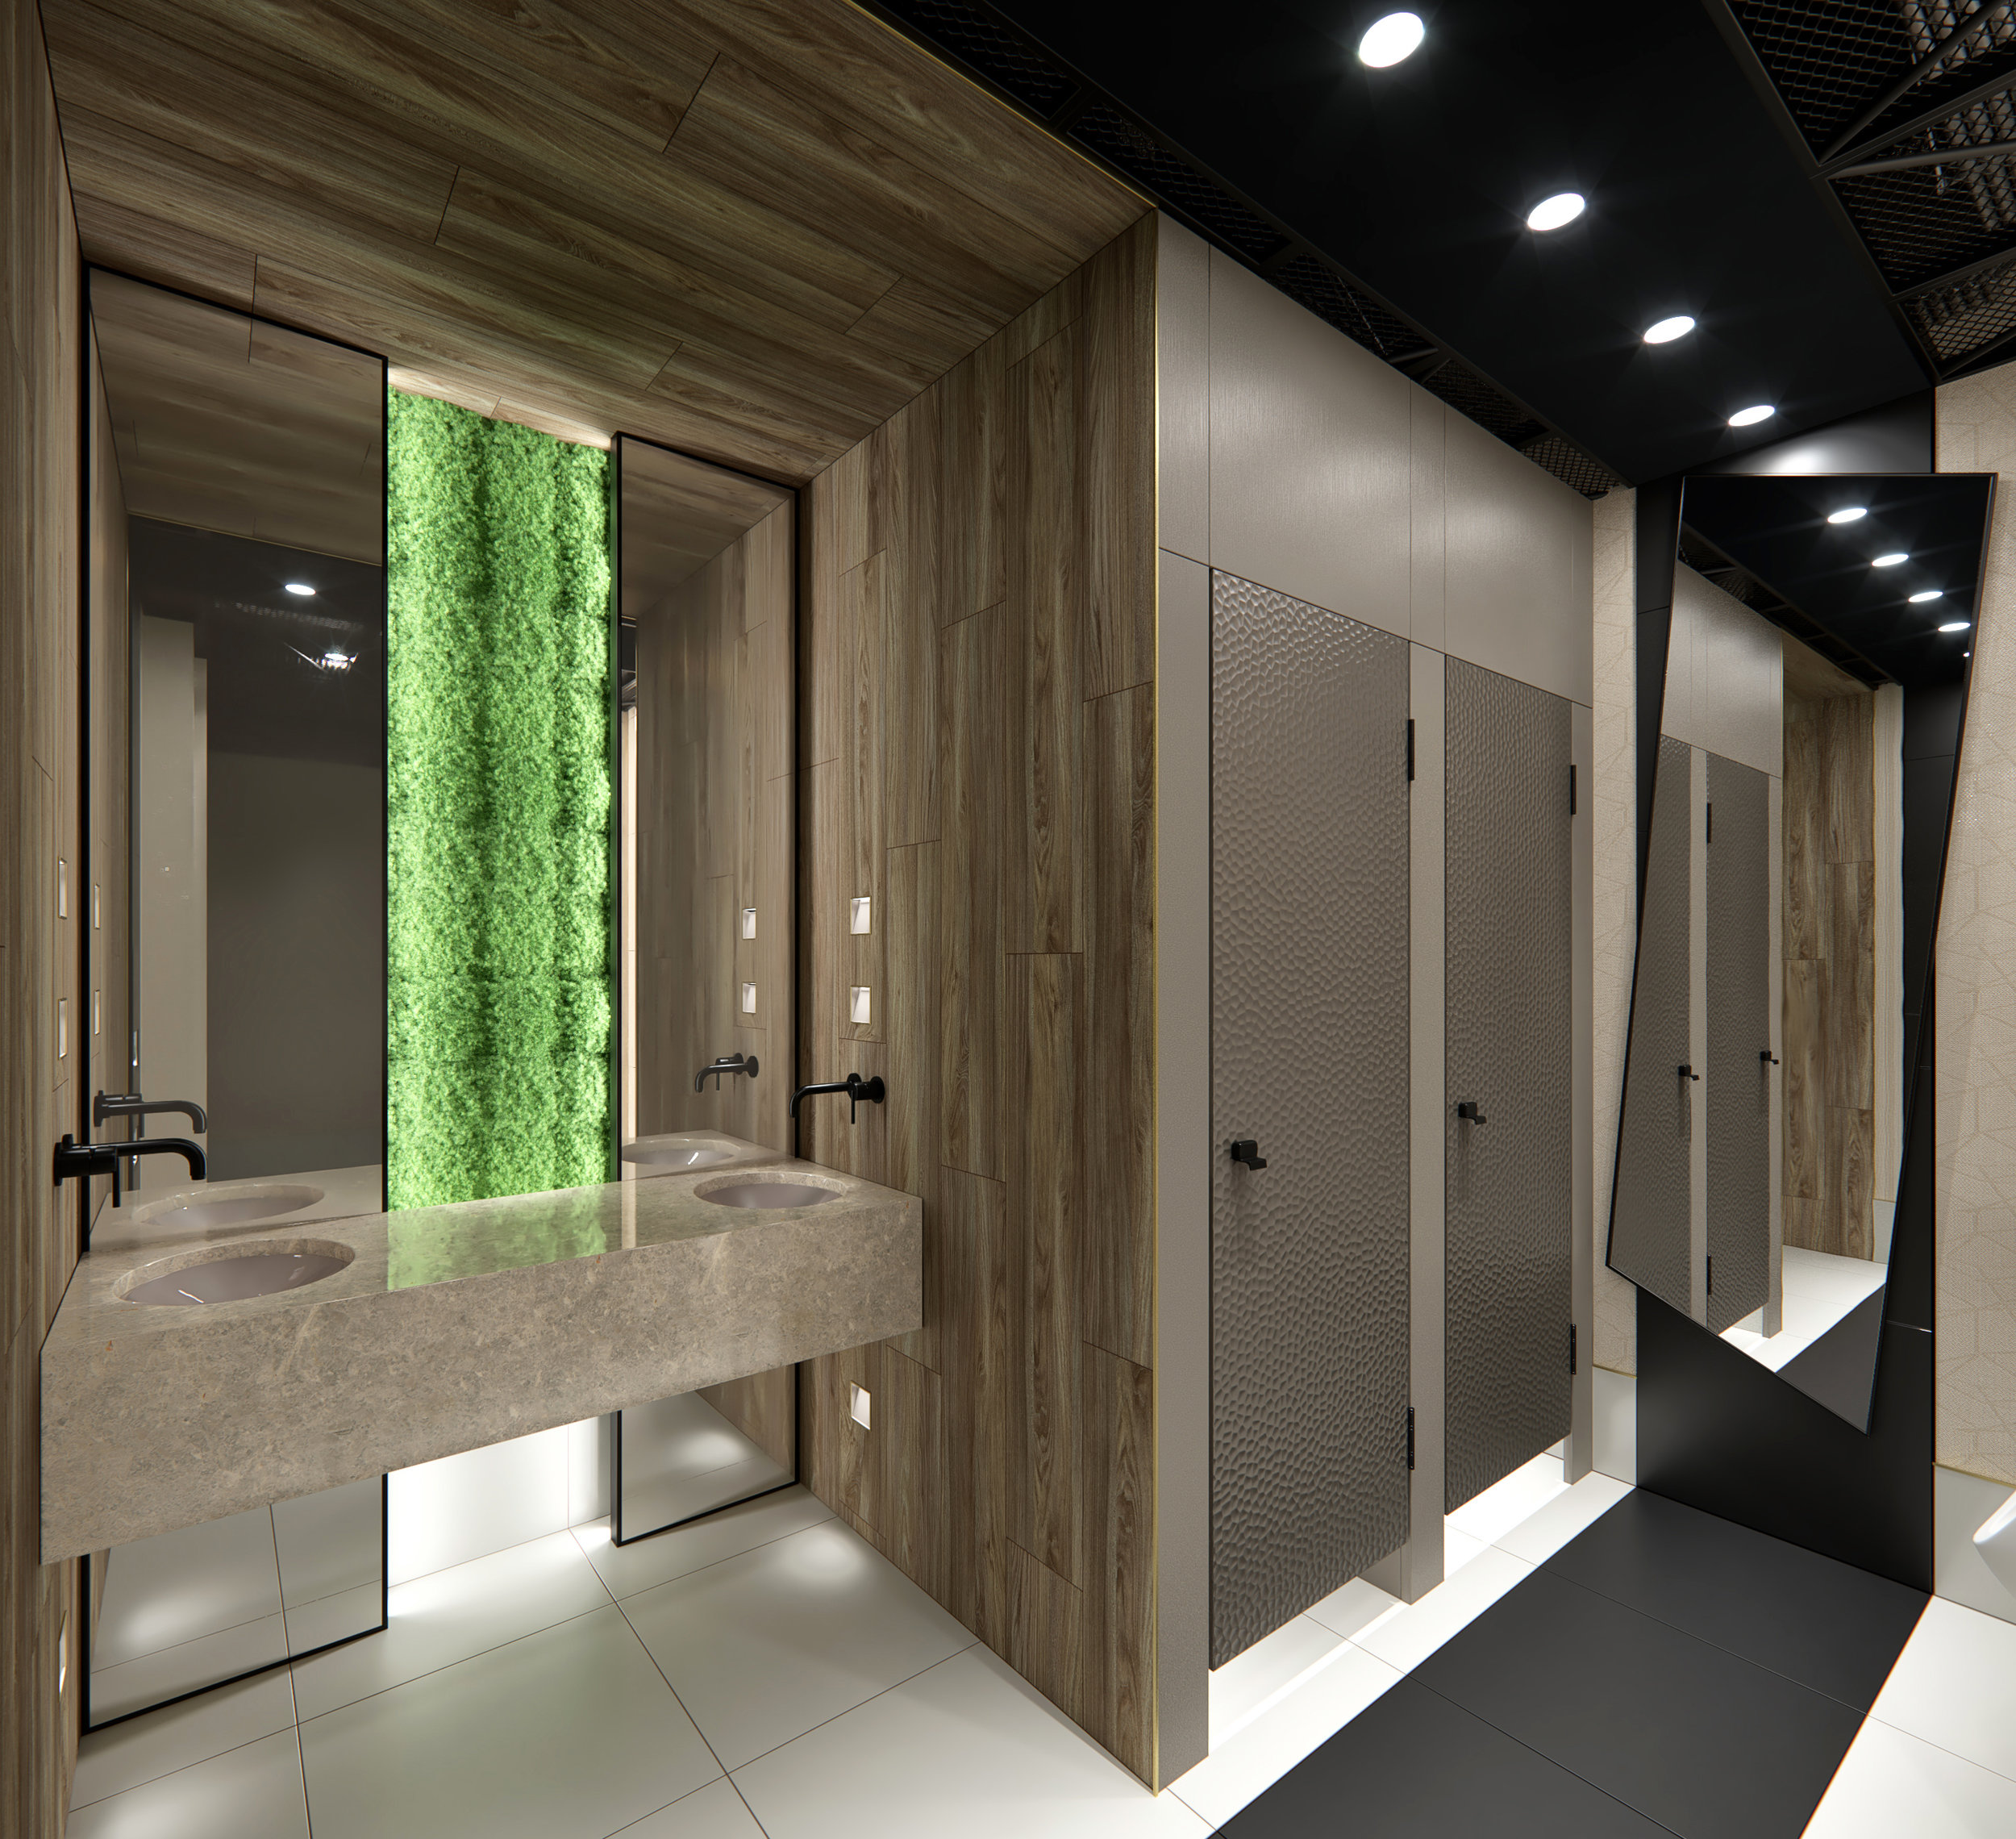 420 5TH AVENUE PUBLIC BATHROOM - MEN - 1.jpg